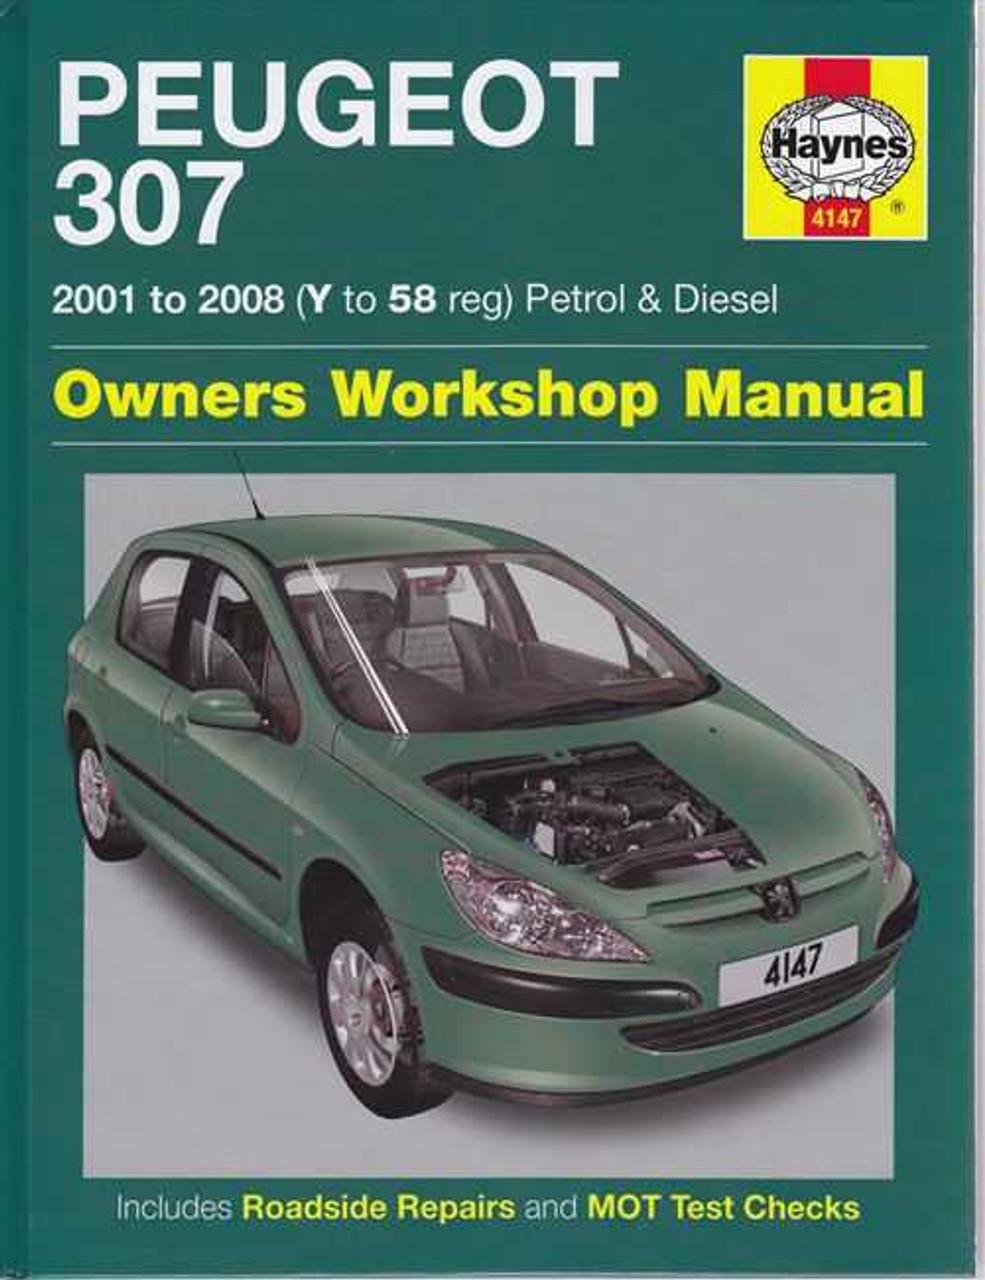 peugeot 307 petrol and diesel 2001 2008 workshop manual rh automotobookshop com au Peugeot 504 Peugeot 208